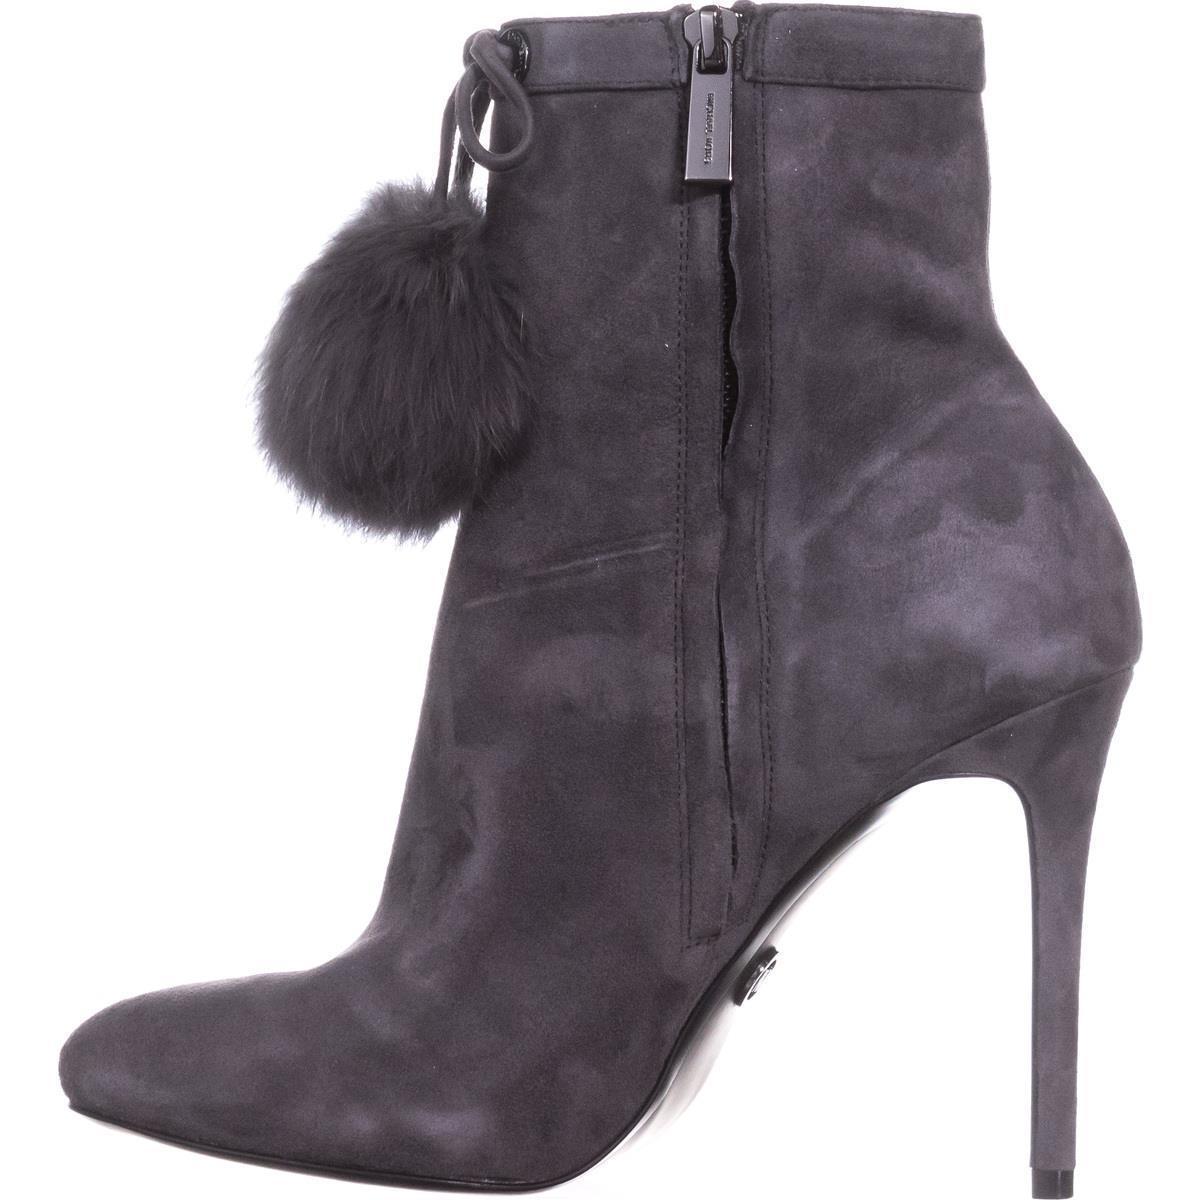 2e59f28782f Womens Fashion Boots Cheap - Libaifoundation.Org Image Fashion